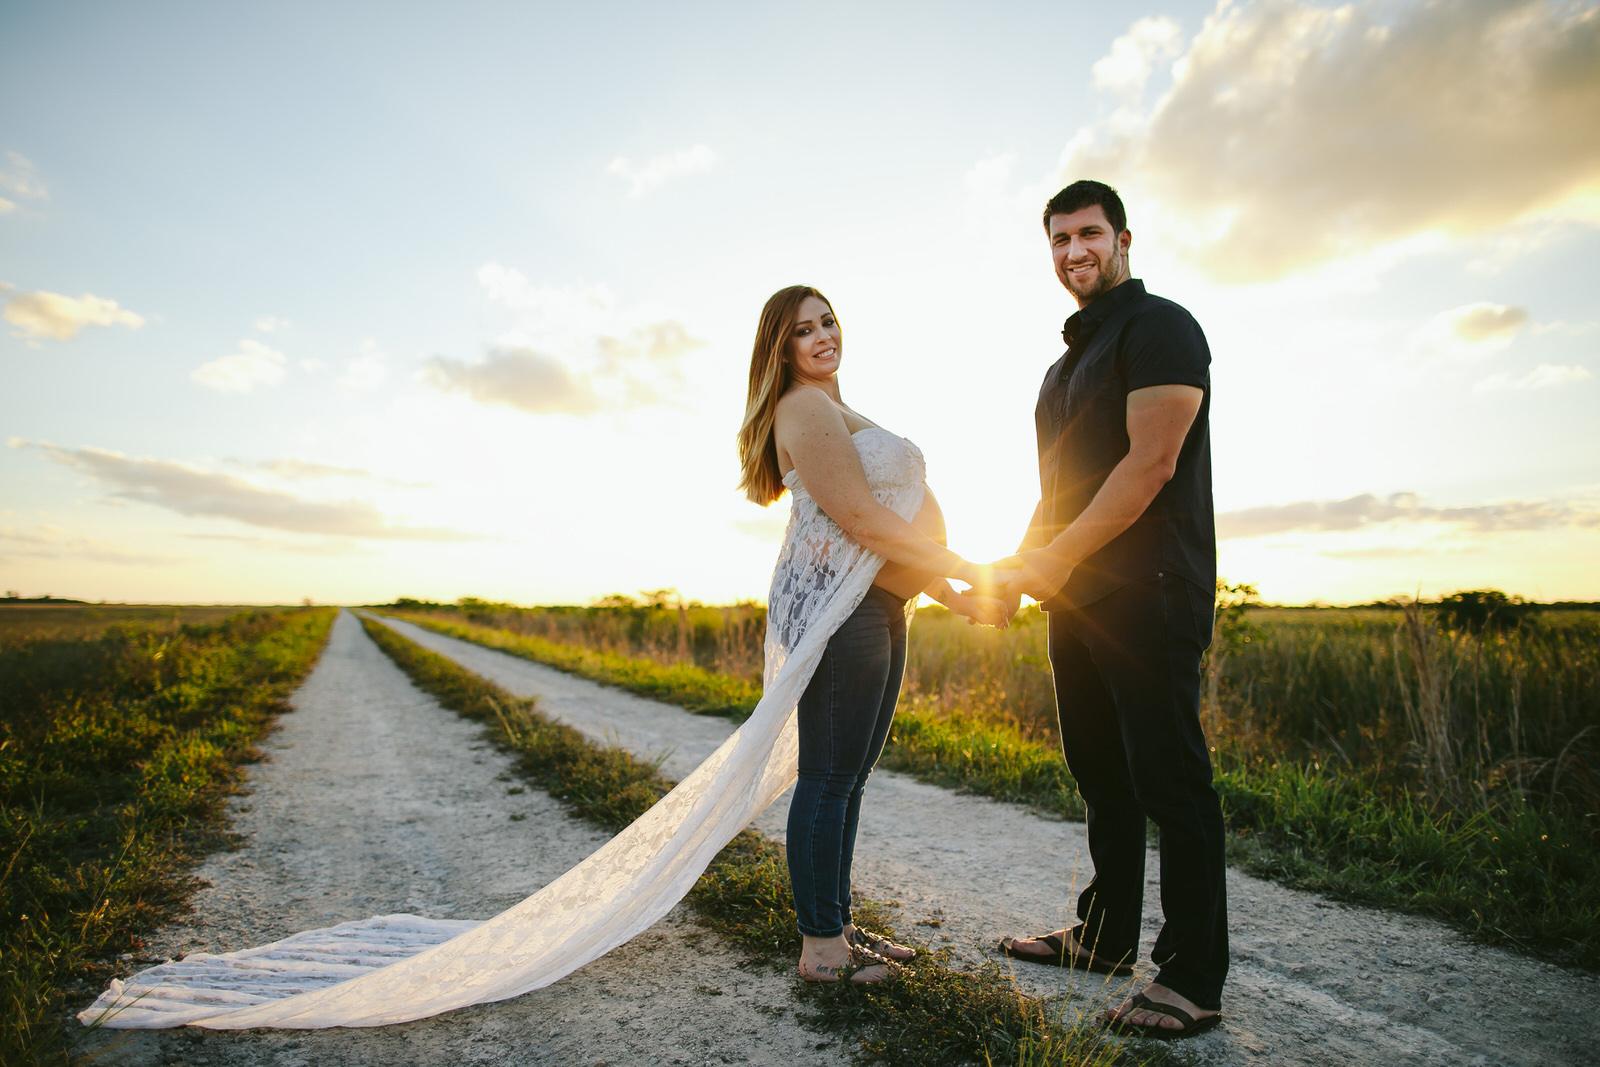 everglades-pregnancy-portraits-florida-maternity-photographer-tiny-house-photo.jpg